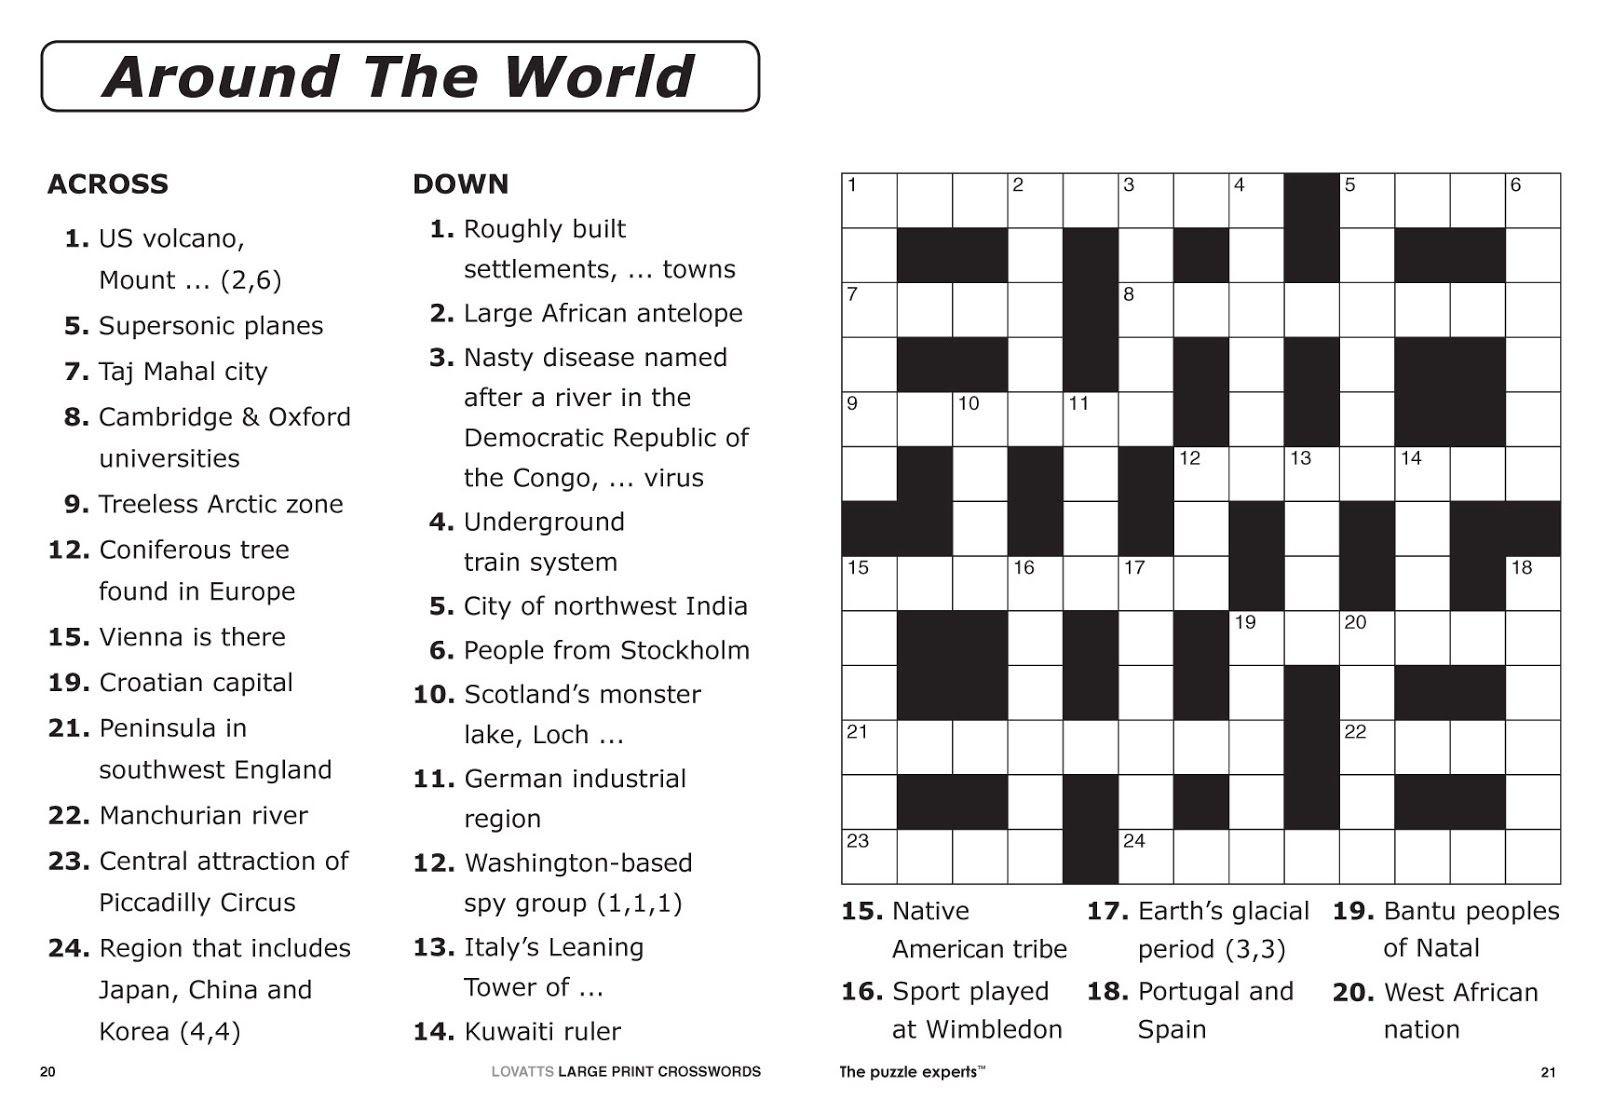 Free Printable Large Print Crossword Puzzles | M3U8 - Free Printable Word Puzzles